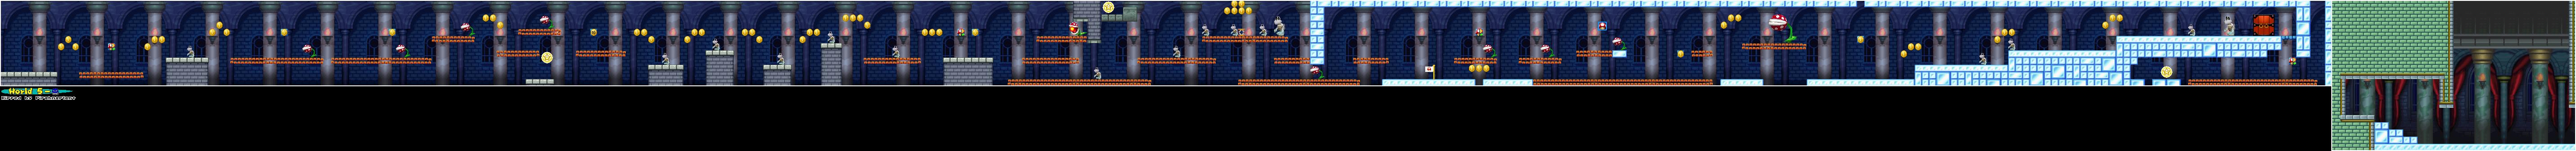 NewSuperMarioBros-World5-Castle.png